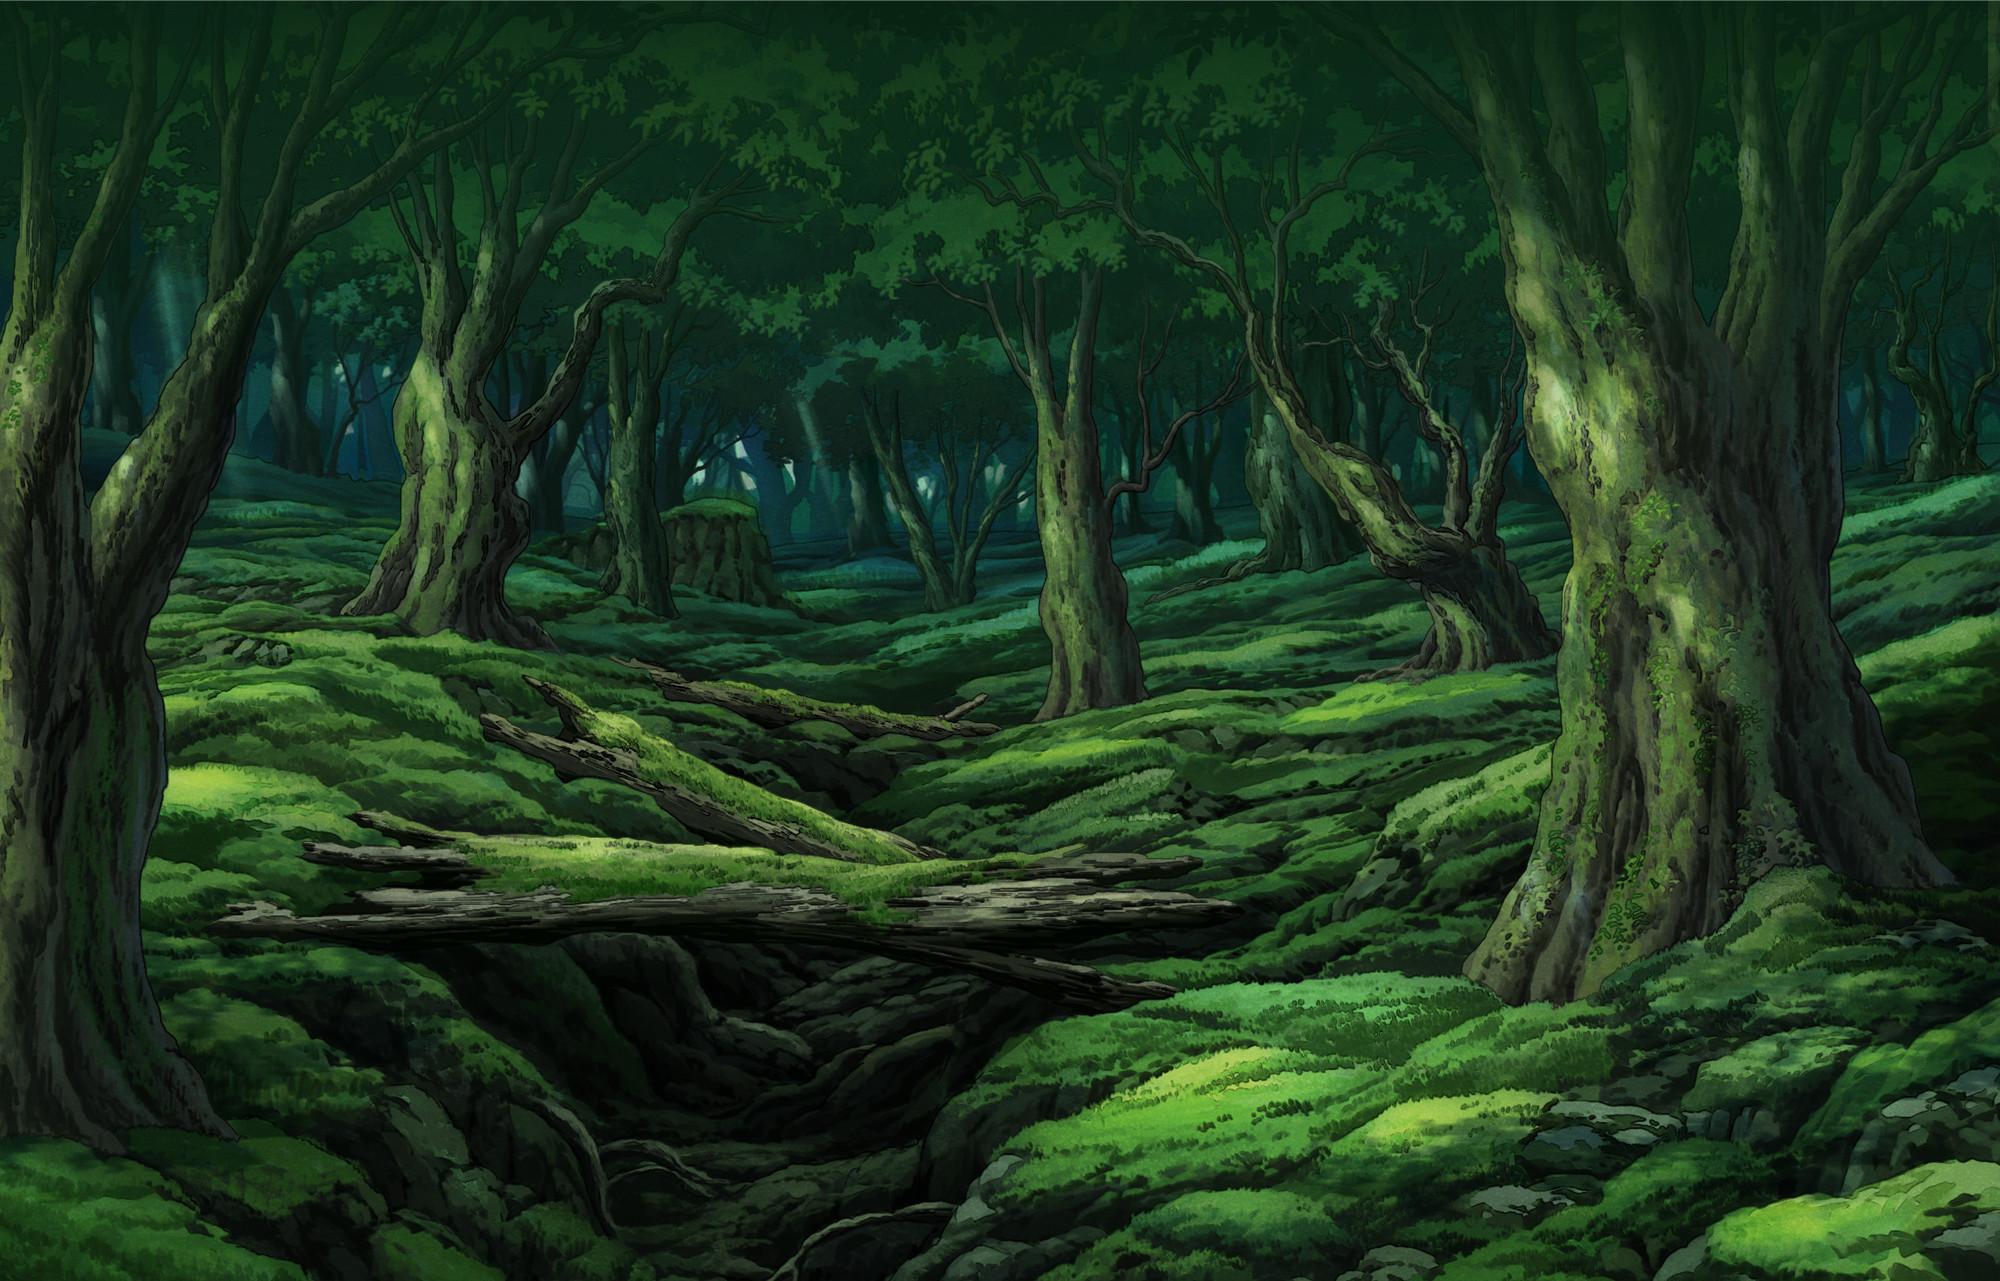 Forest of White Dreams | Nanatsu no Taizai Wiki | FANDOM powered by Wikia